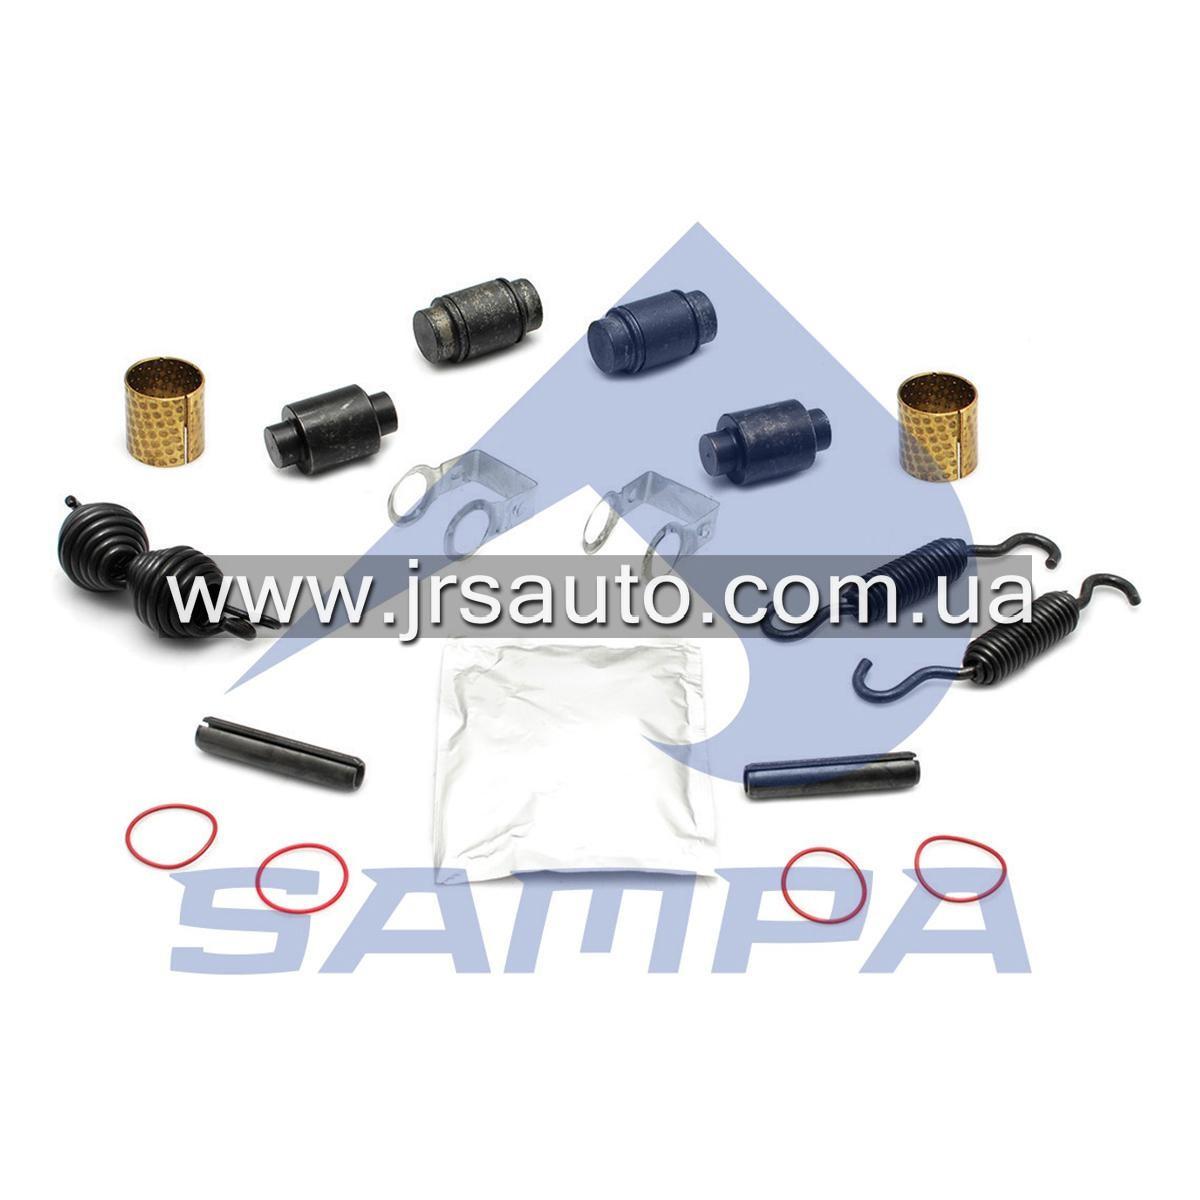 Ремкомплект колодки тормозной ROR AXL117 d19 d31,7x55,5 \AXL117 \ 085.510